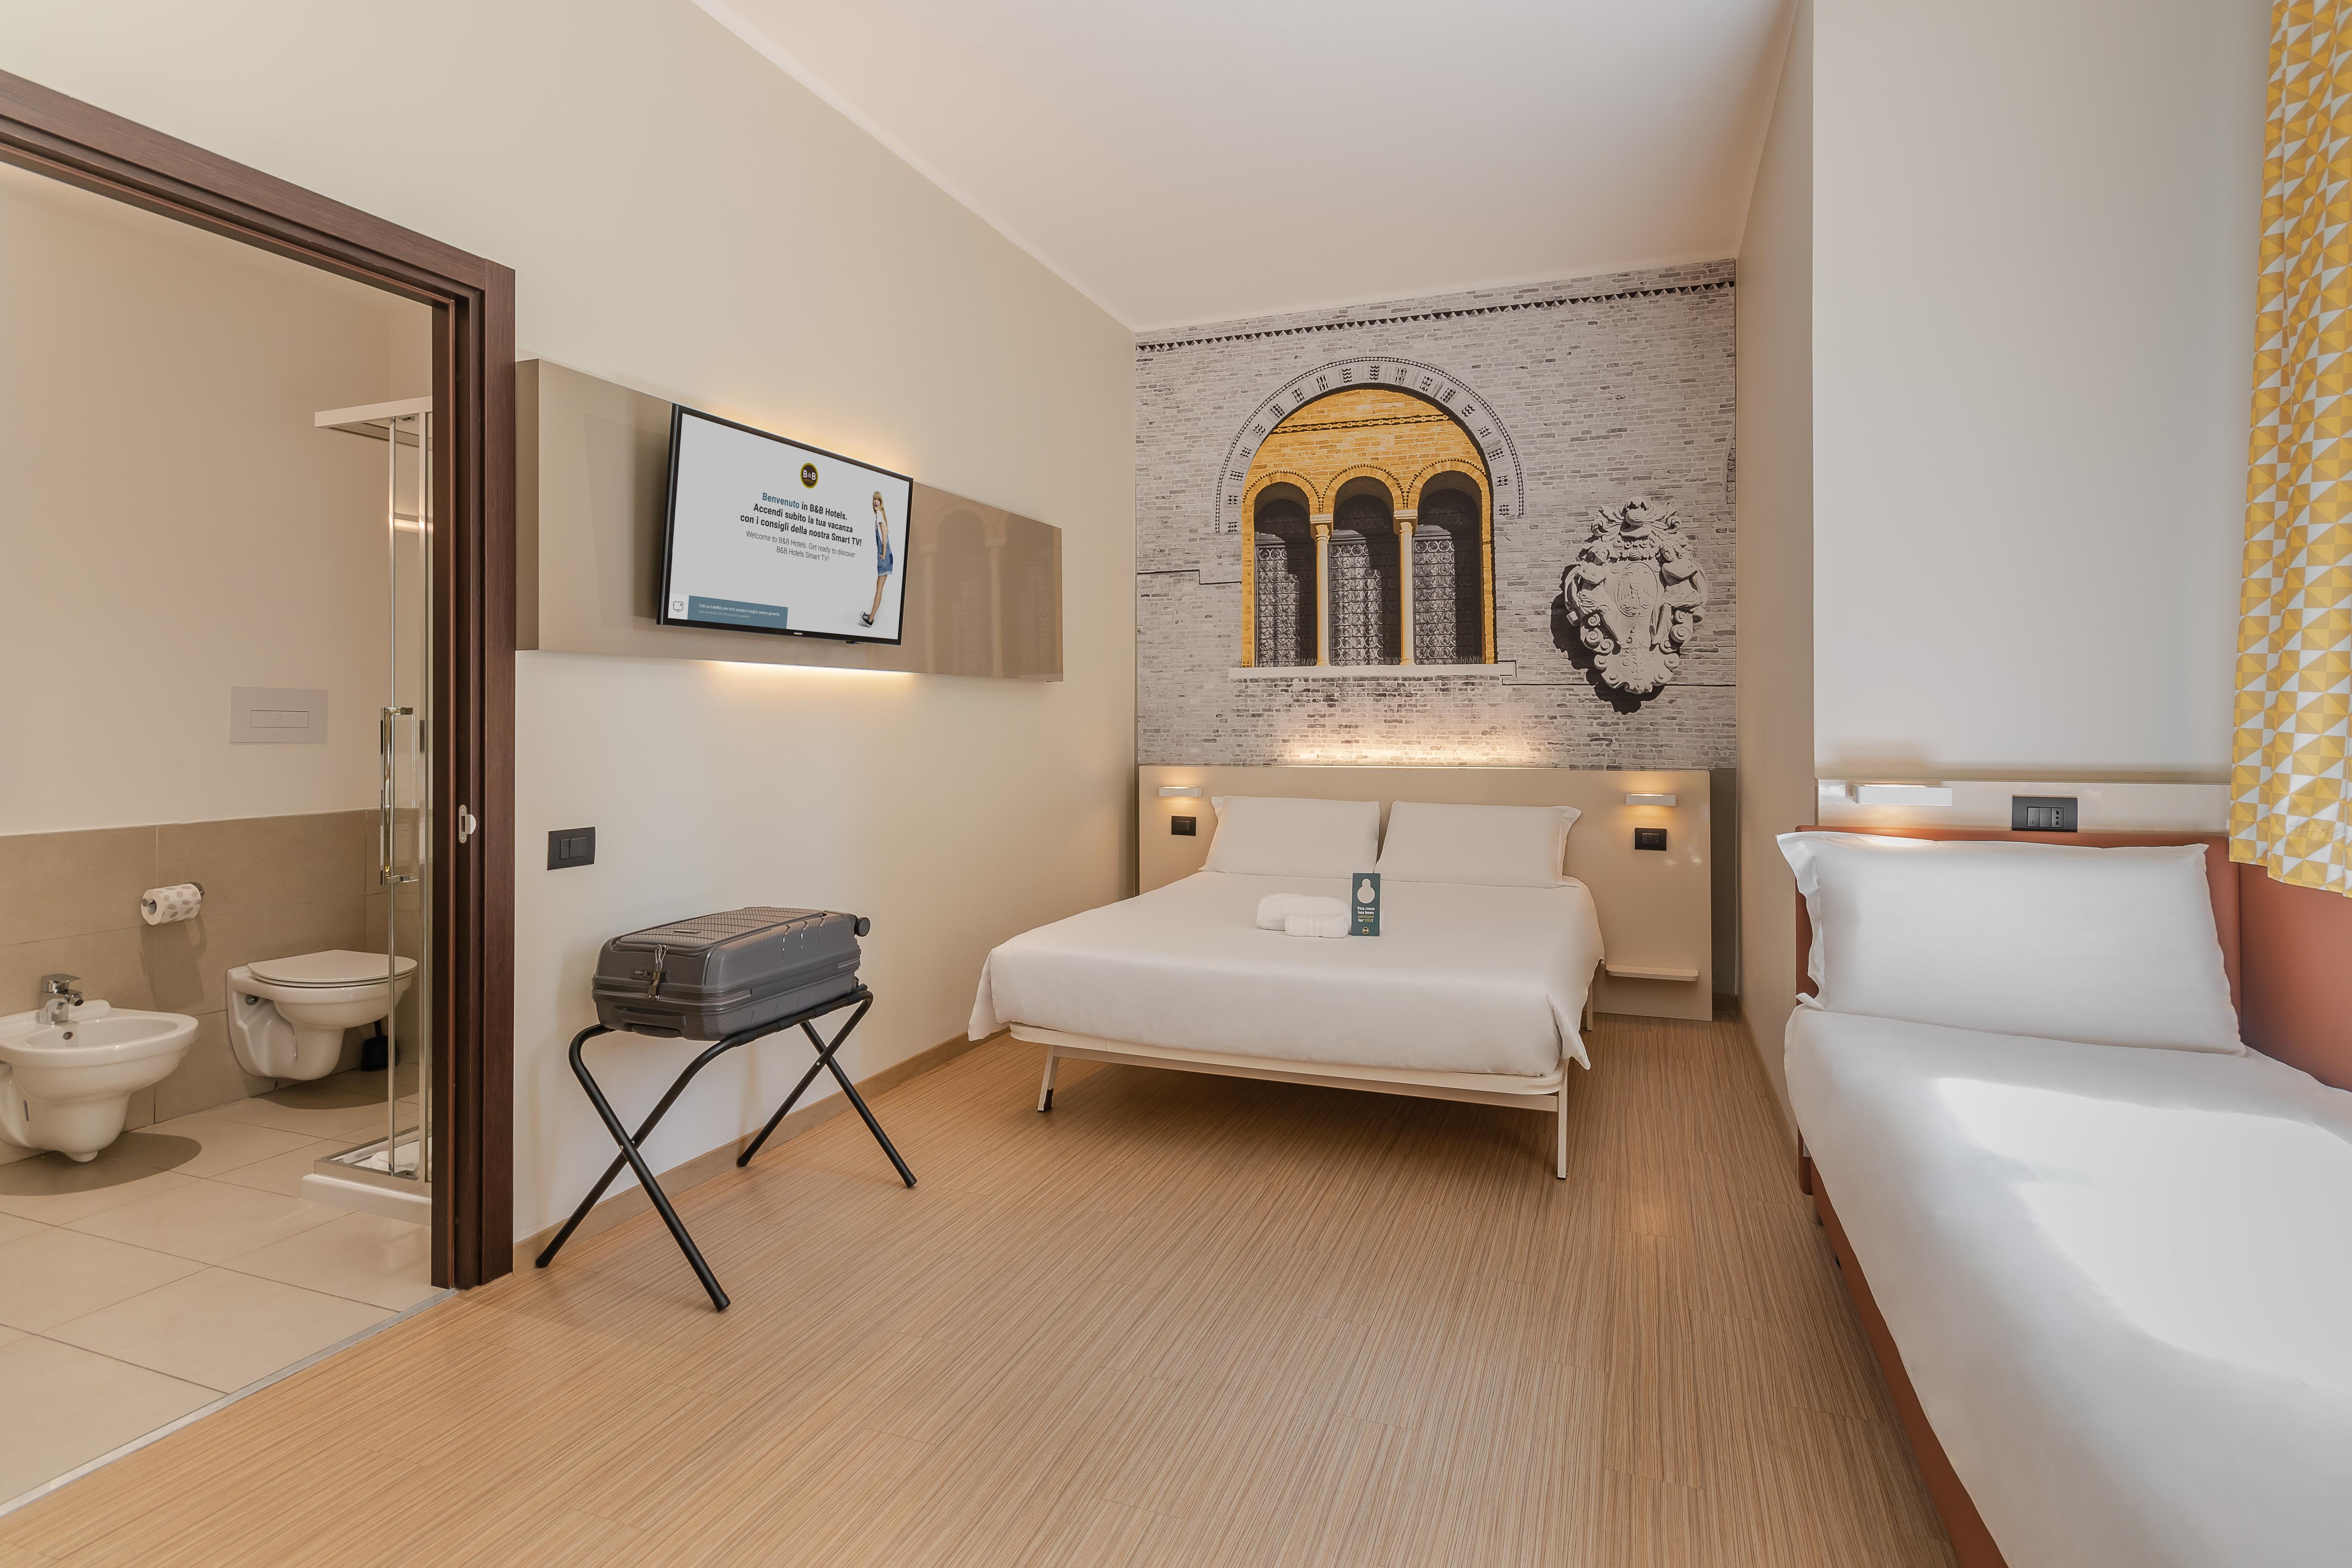 B&b Hotel Treviso